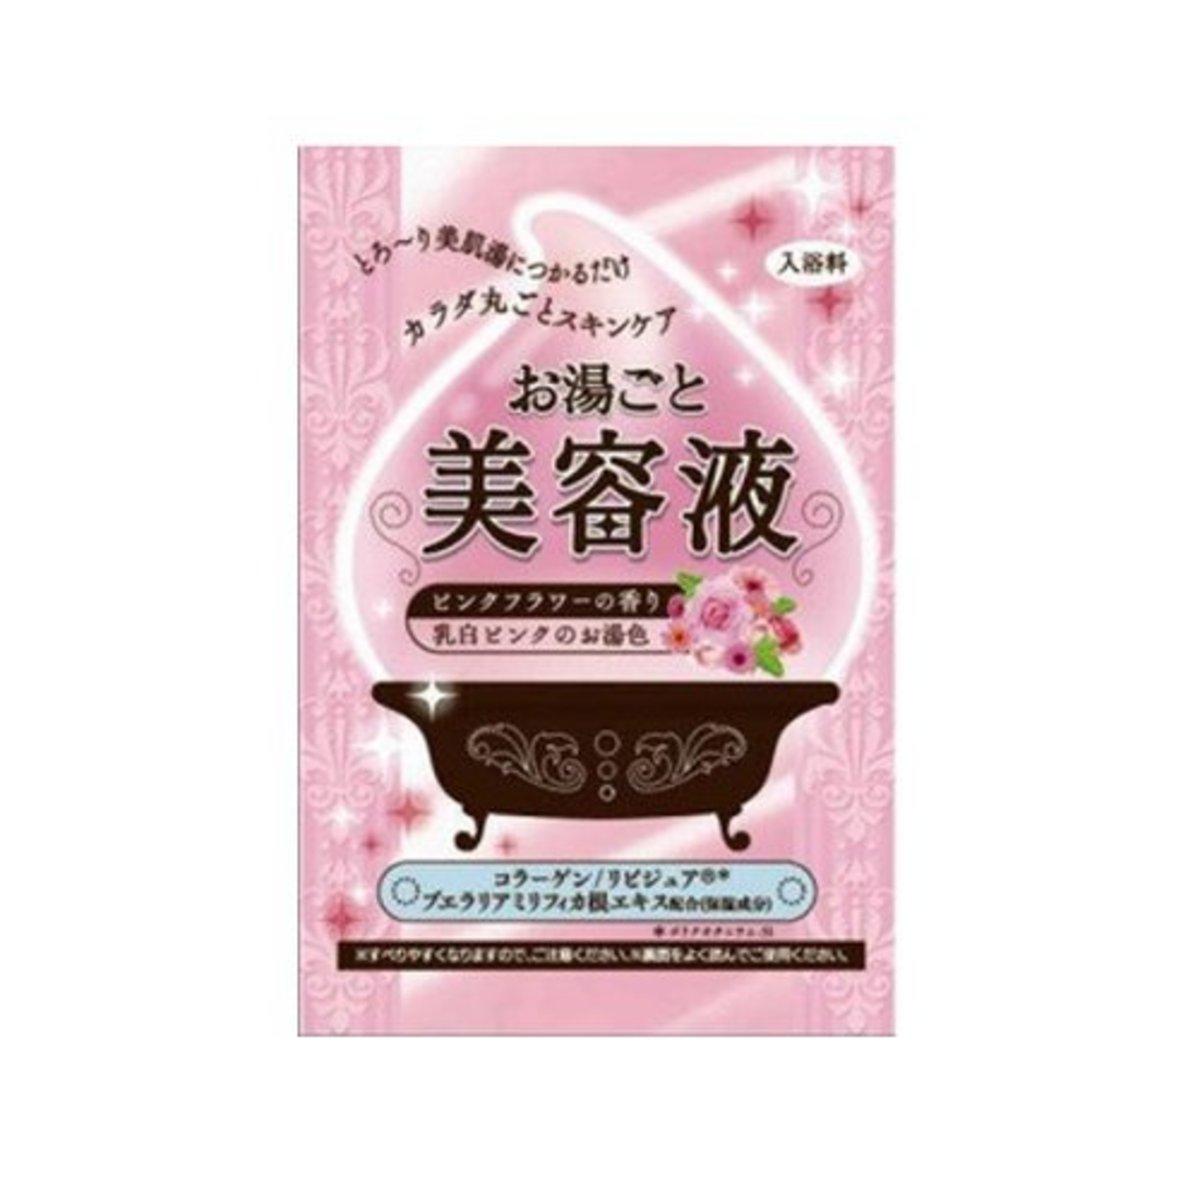 Bison Bison Bath Beauty Essence Pink Flower Scent 60g Hktvmall